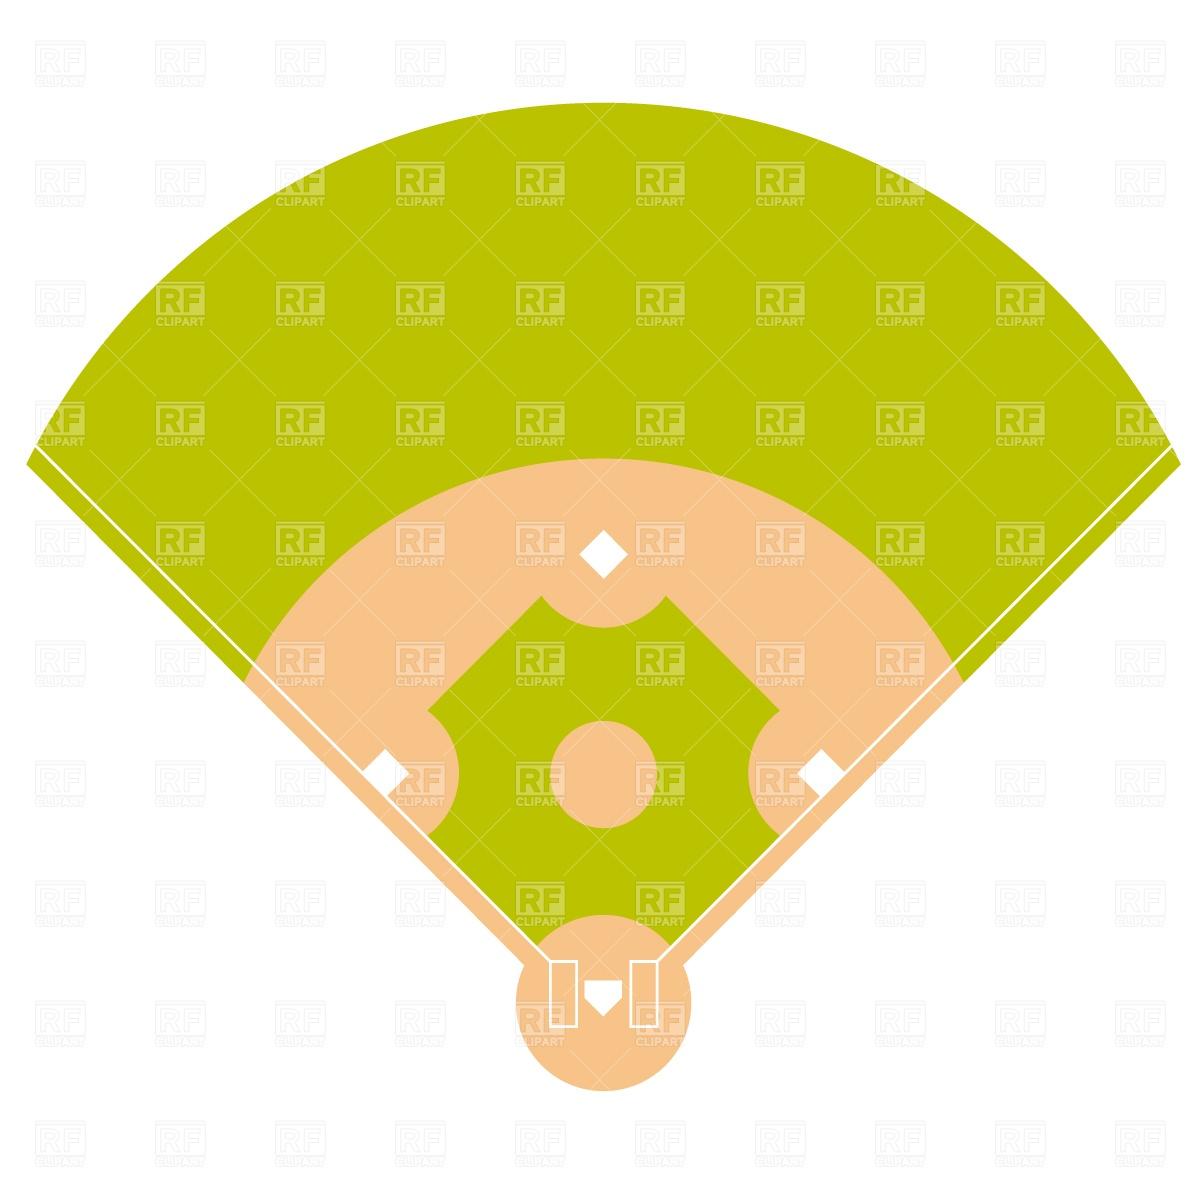 1200x1200 Baseball Field Plan Royalty Free Vector Clip Art Image